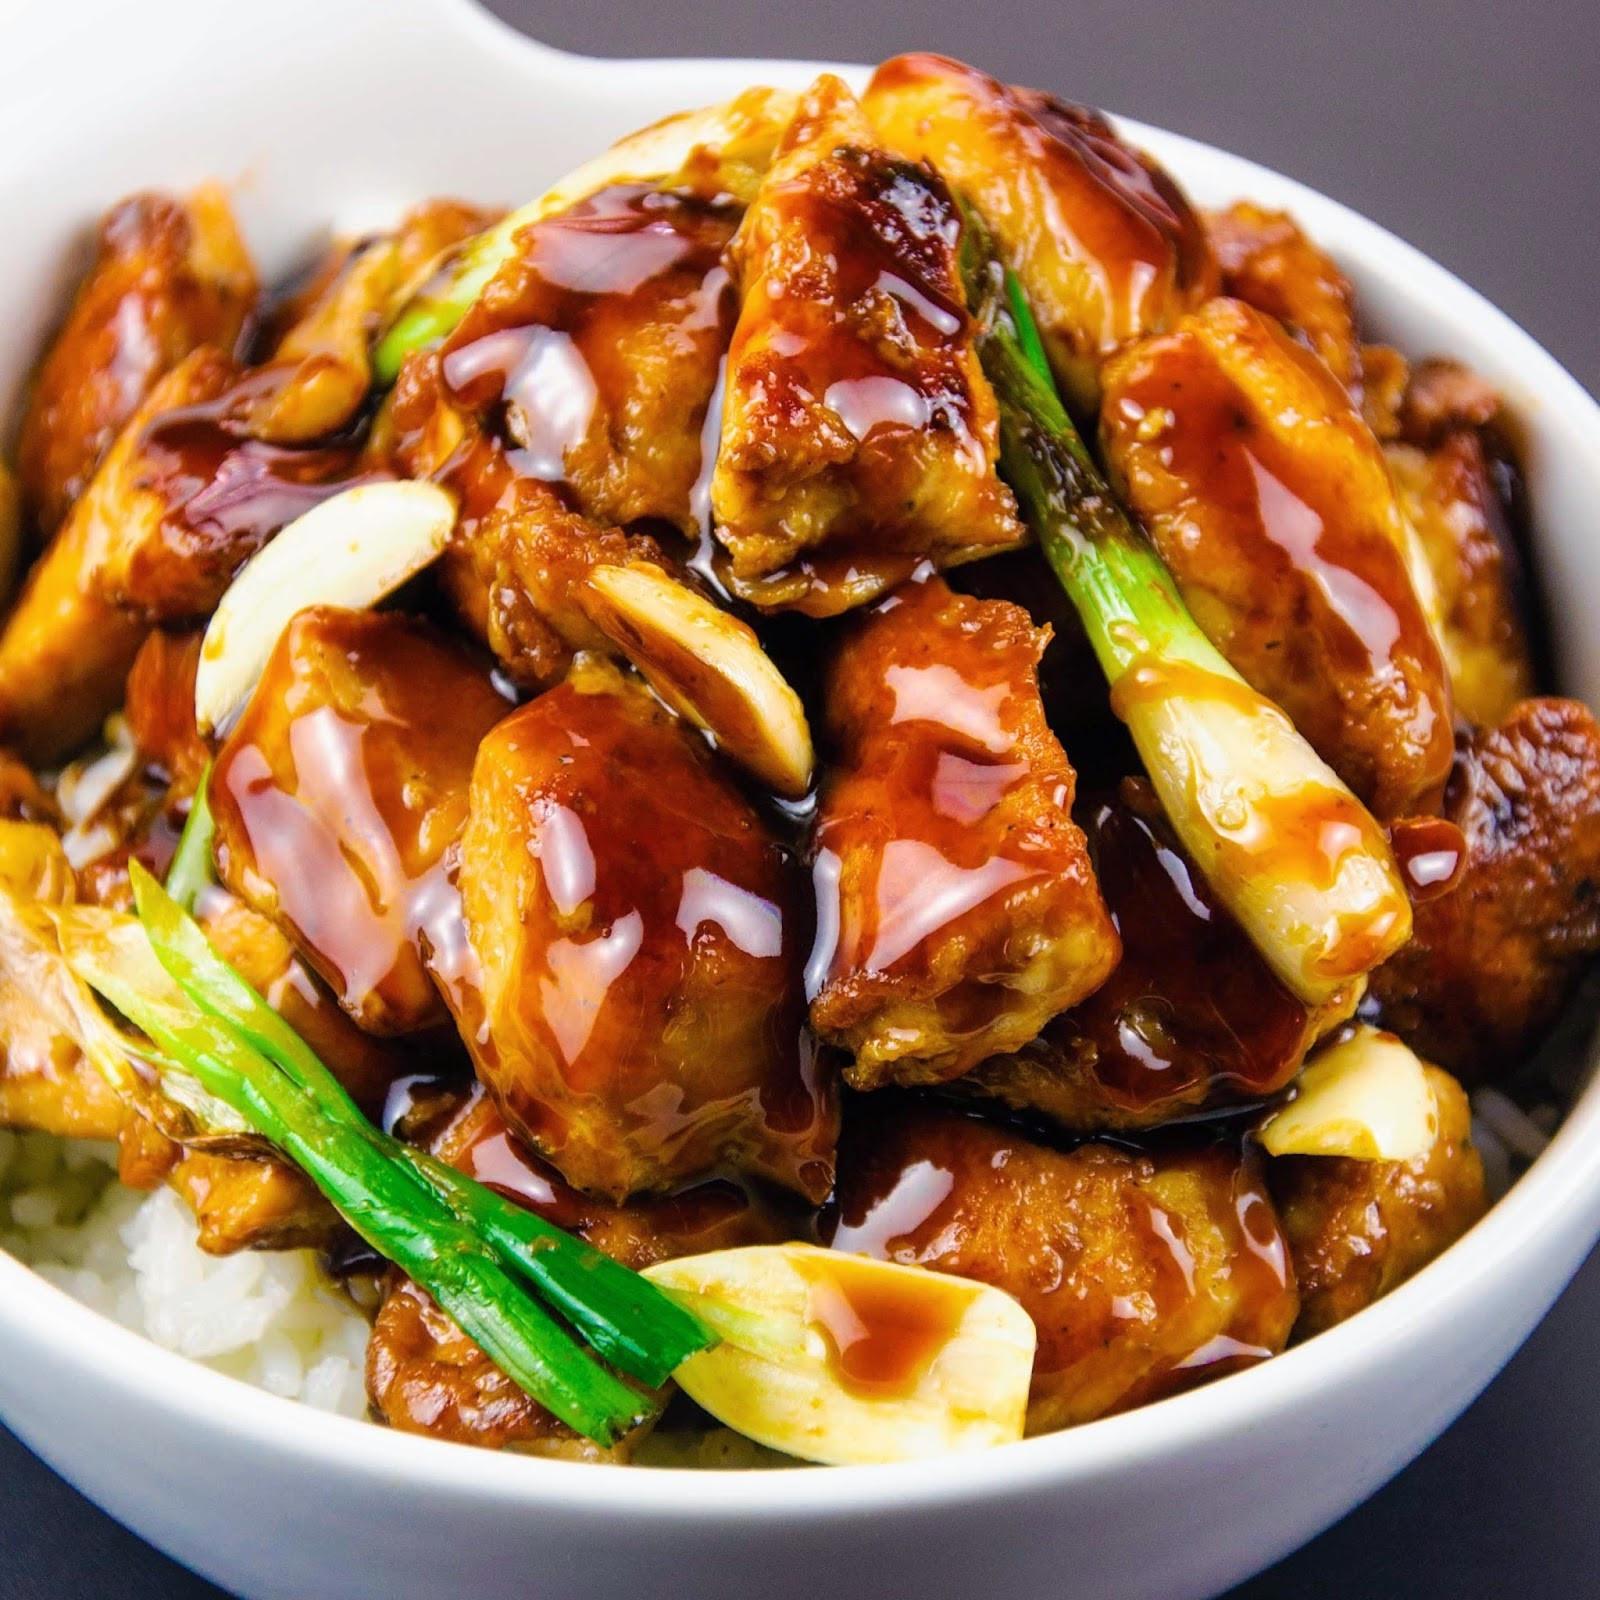 Dinner Recipes For Diabetic  Diabetic Recipes for Dinner – Diabetic Dinner Recipes